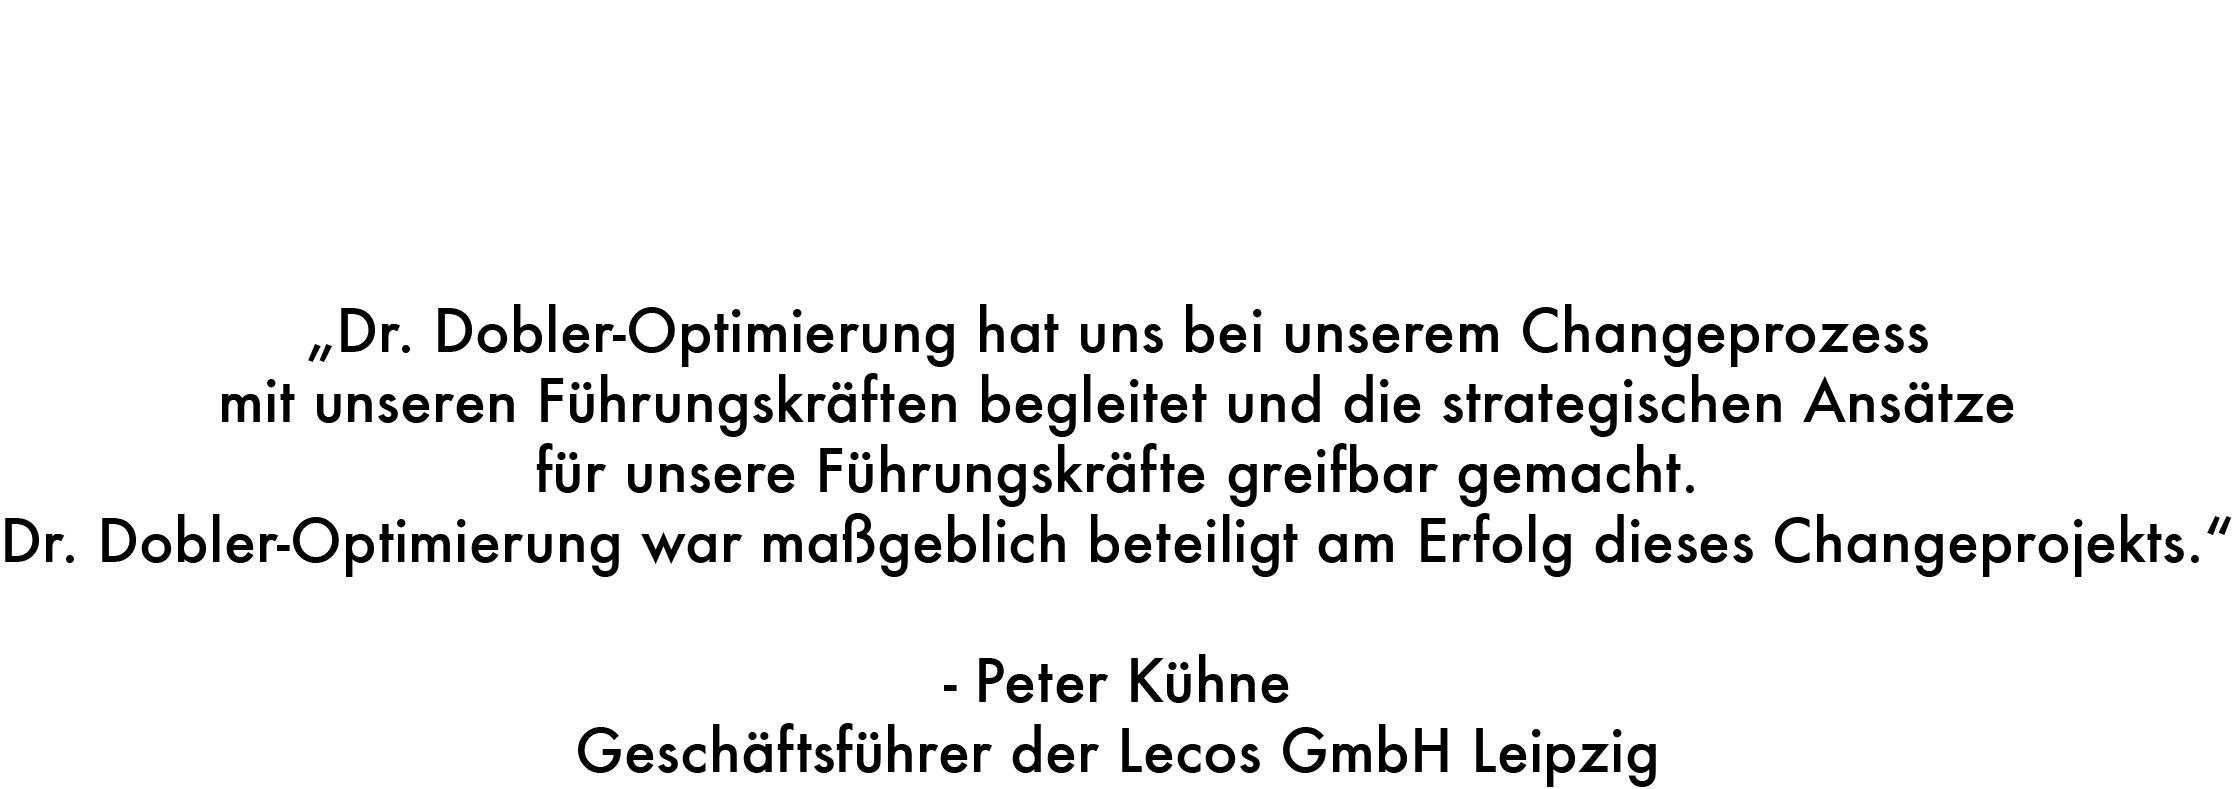 Webseite_Referenzen_PeterKuehne.png